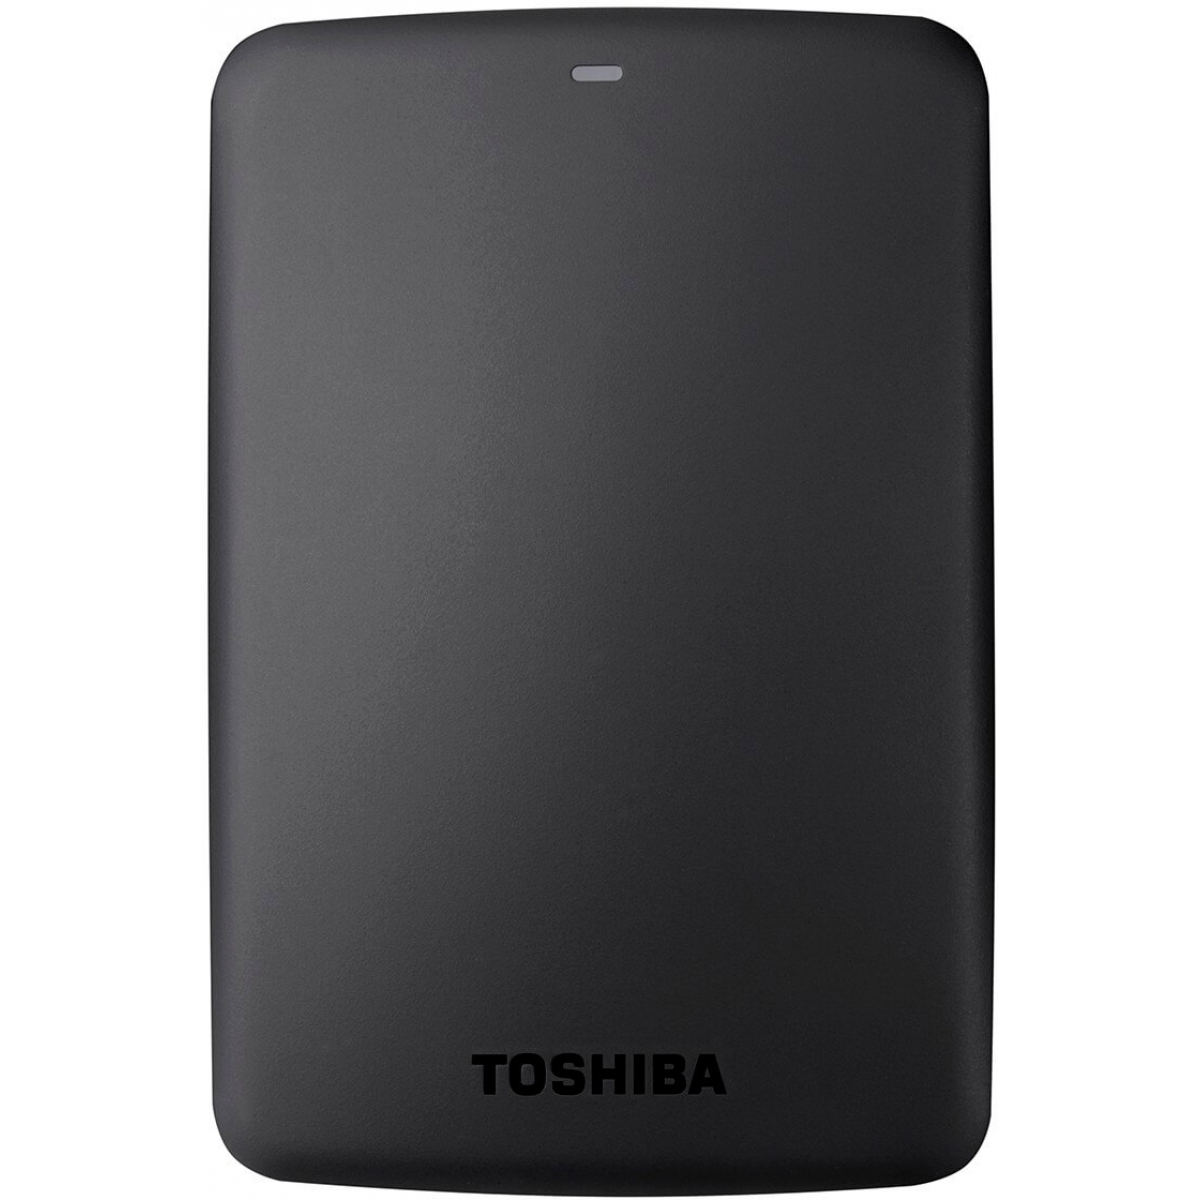 HD Externo Portátil Toshiba Canvio Basics 3TB HDTB330XK3CA USB 3.0 Preto